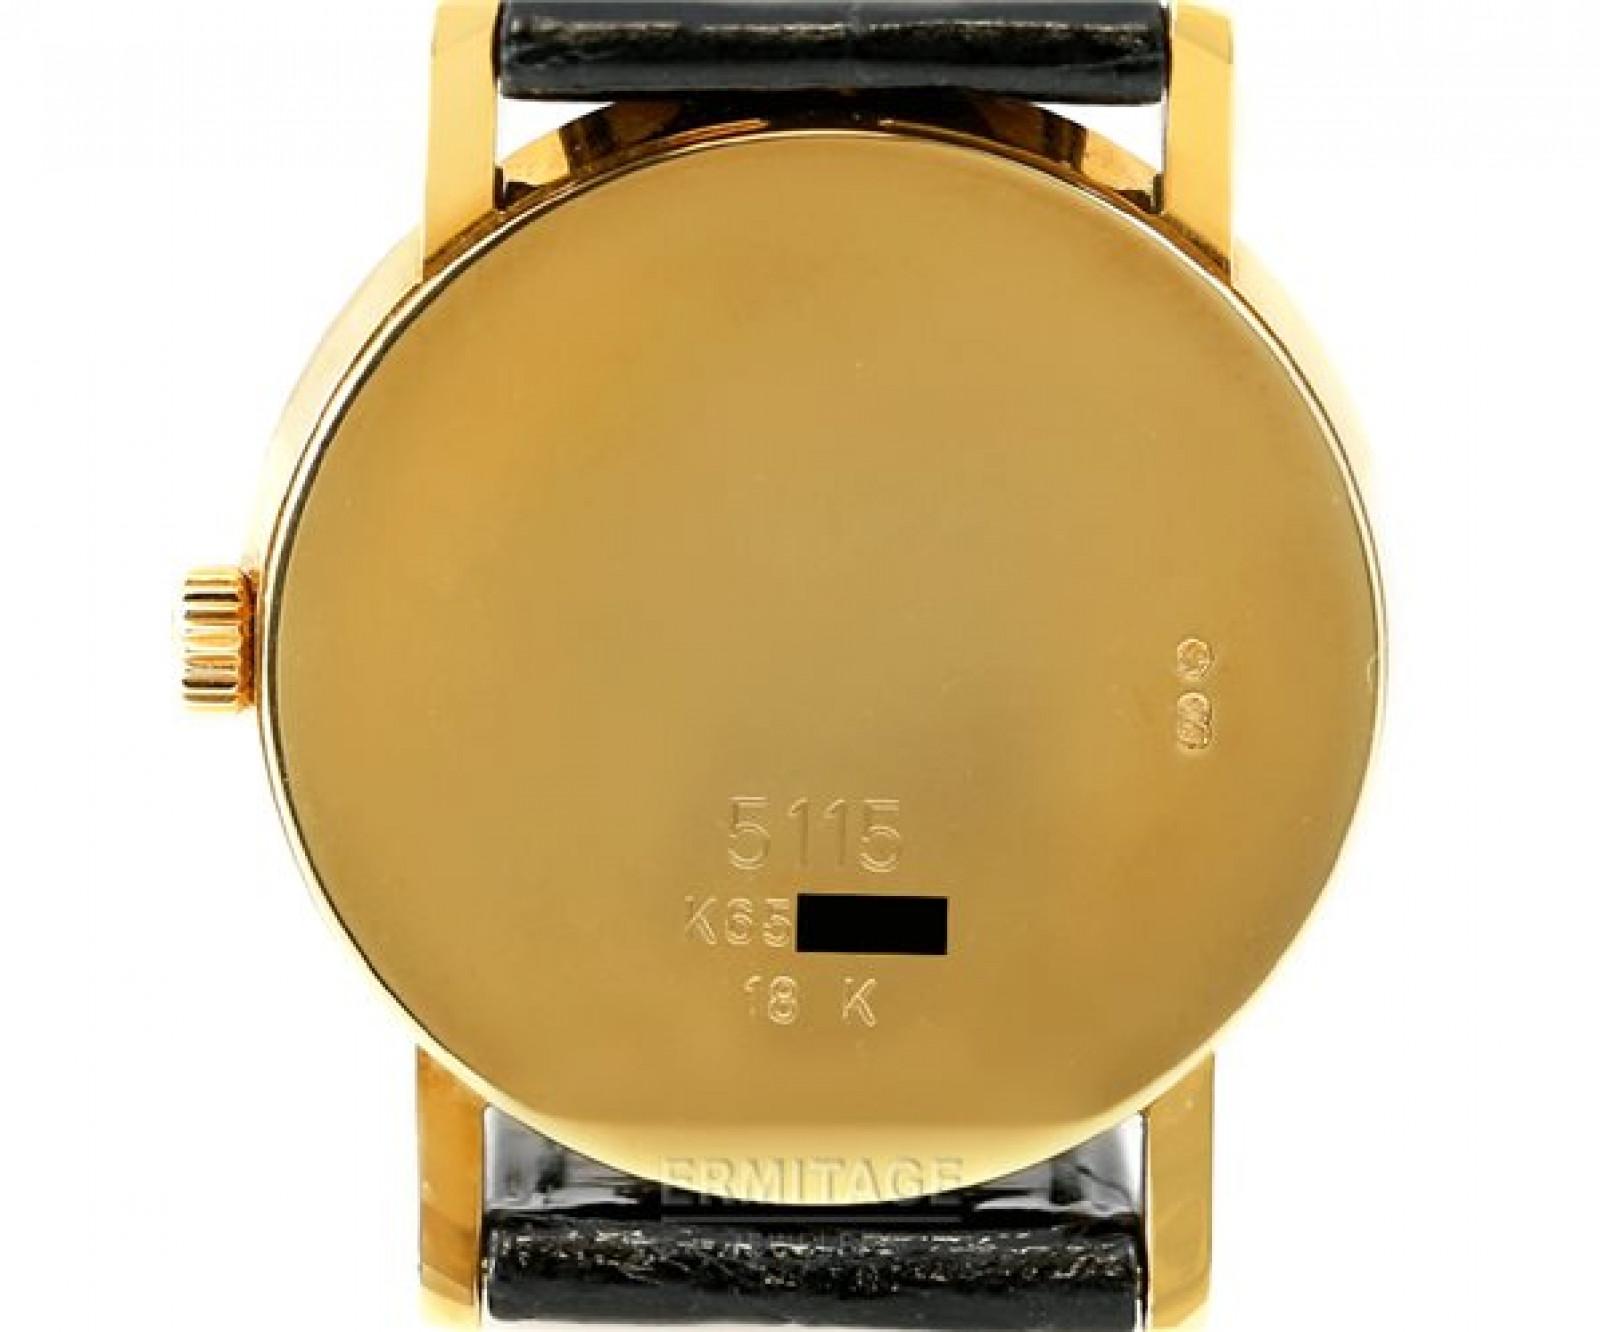 Rolex Cellini 5115 Gold Year 2002